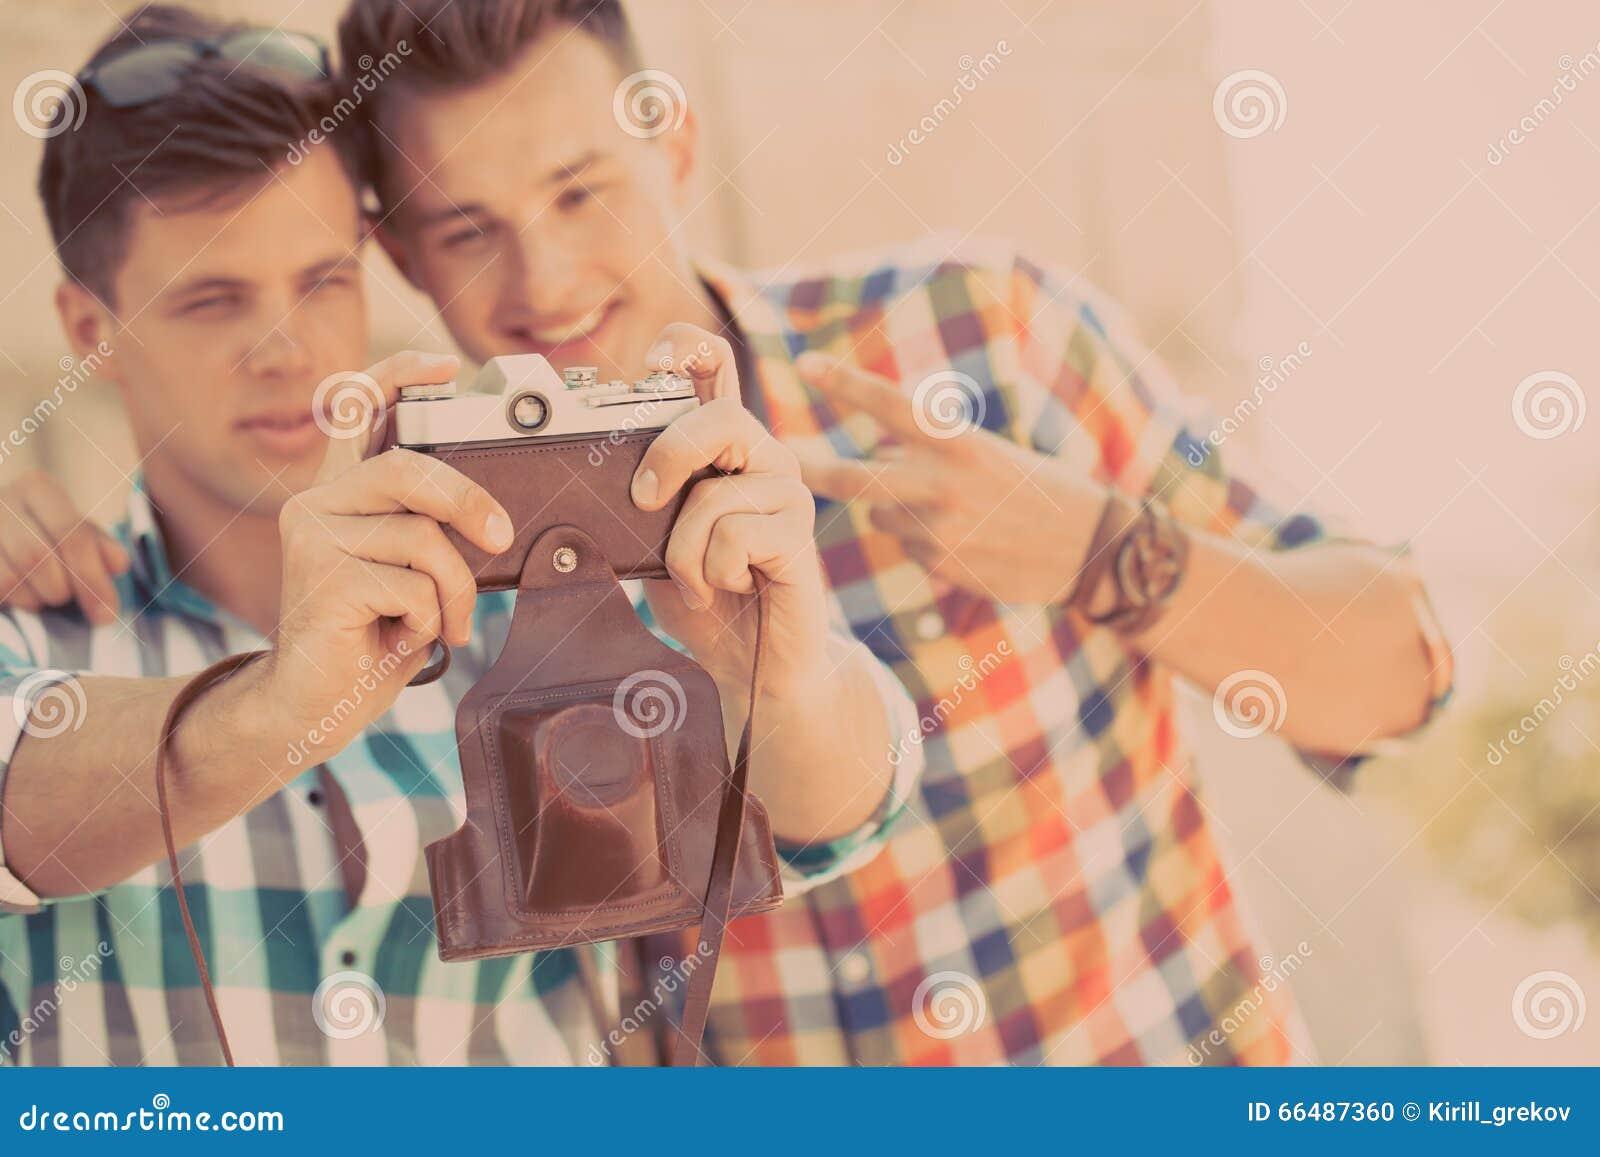 two boys with retro photo camera stock photo image of leisure